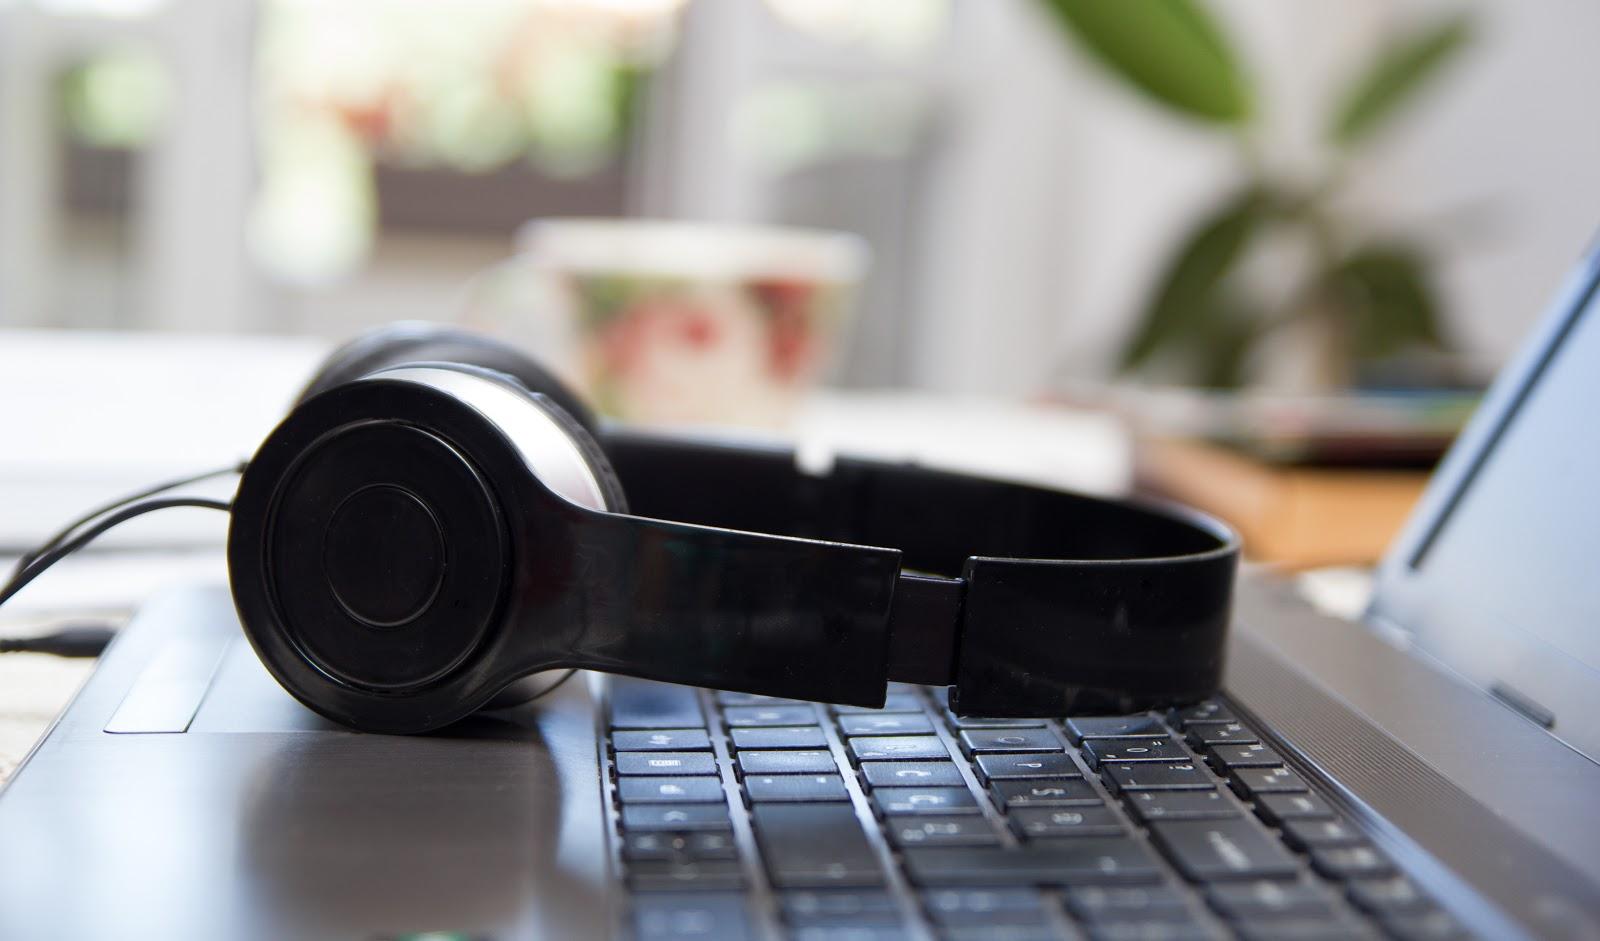 auriculares en laptop